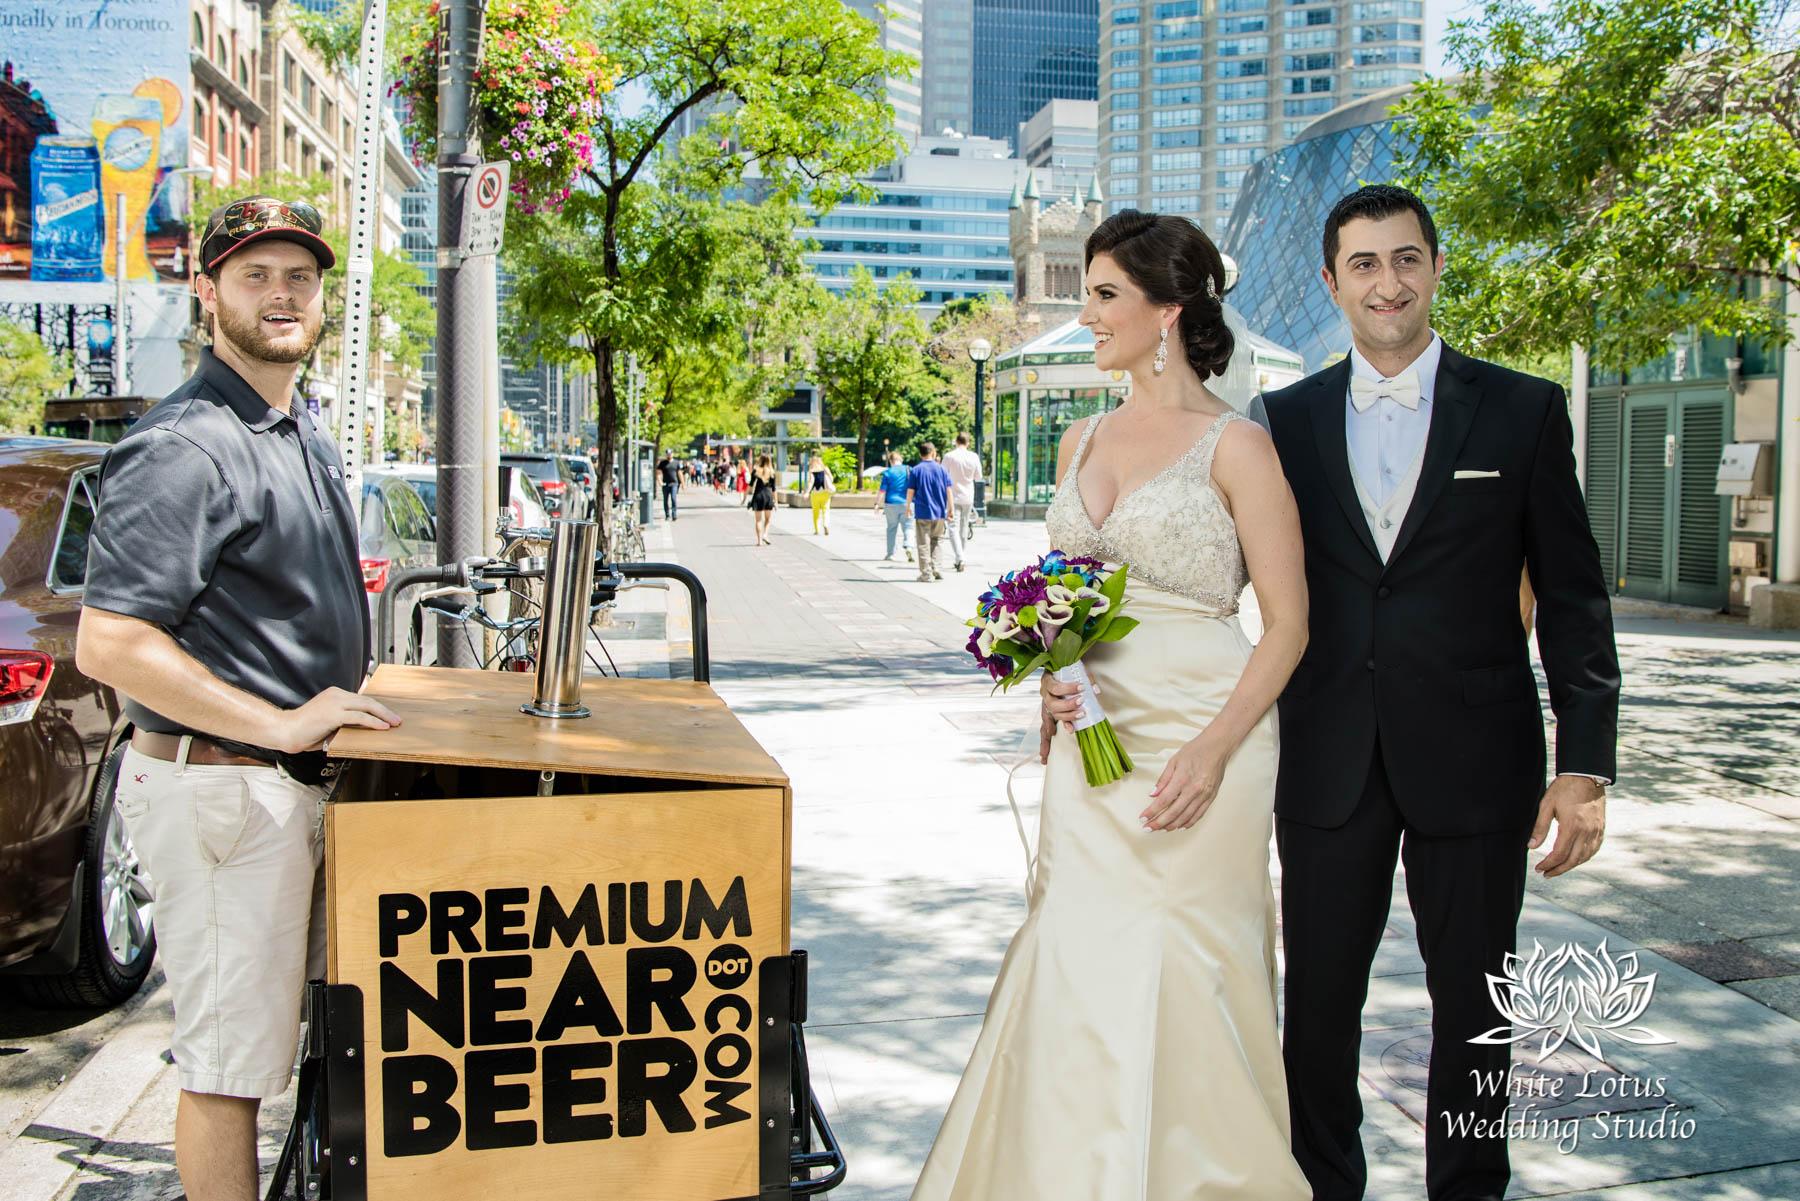 073 - Wedding - Toronto - Downtown wedding photo-walk - PW